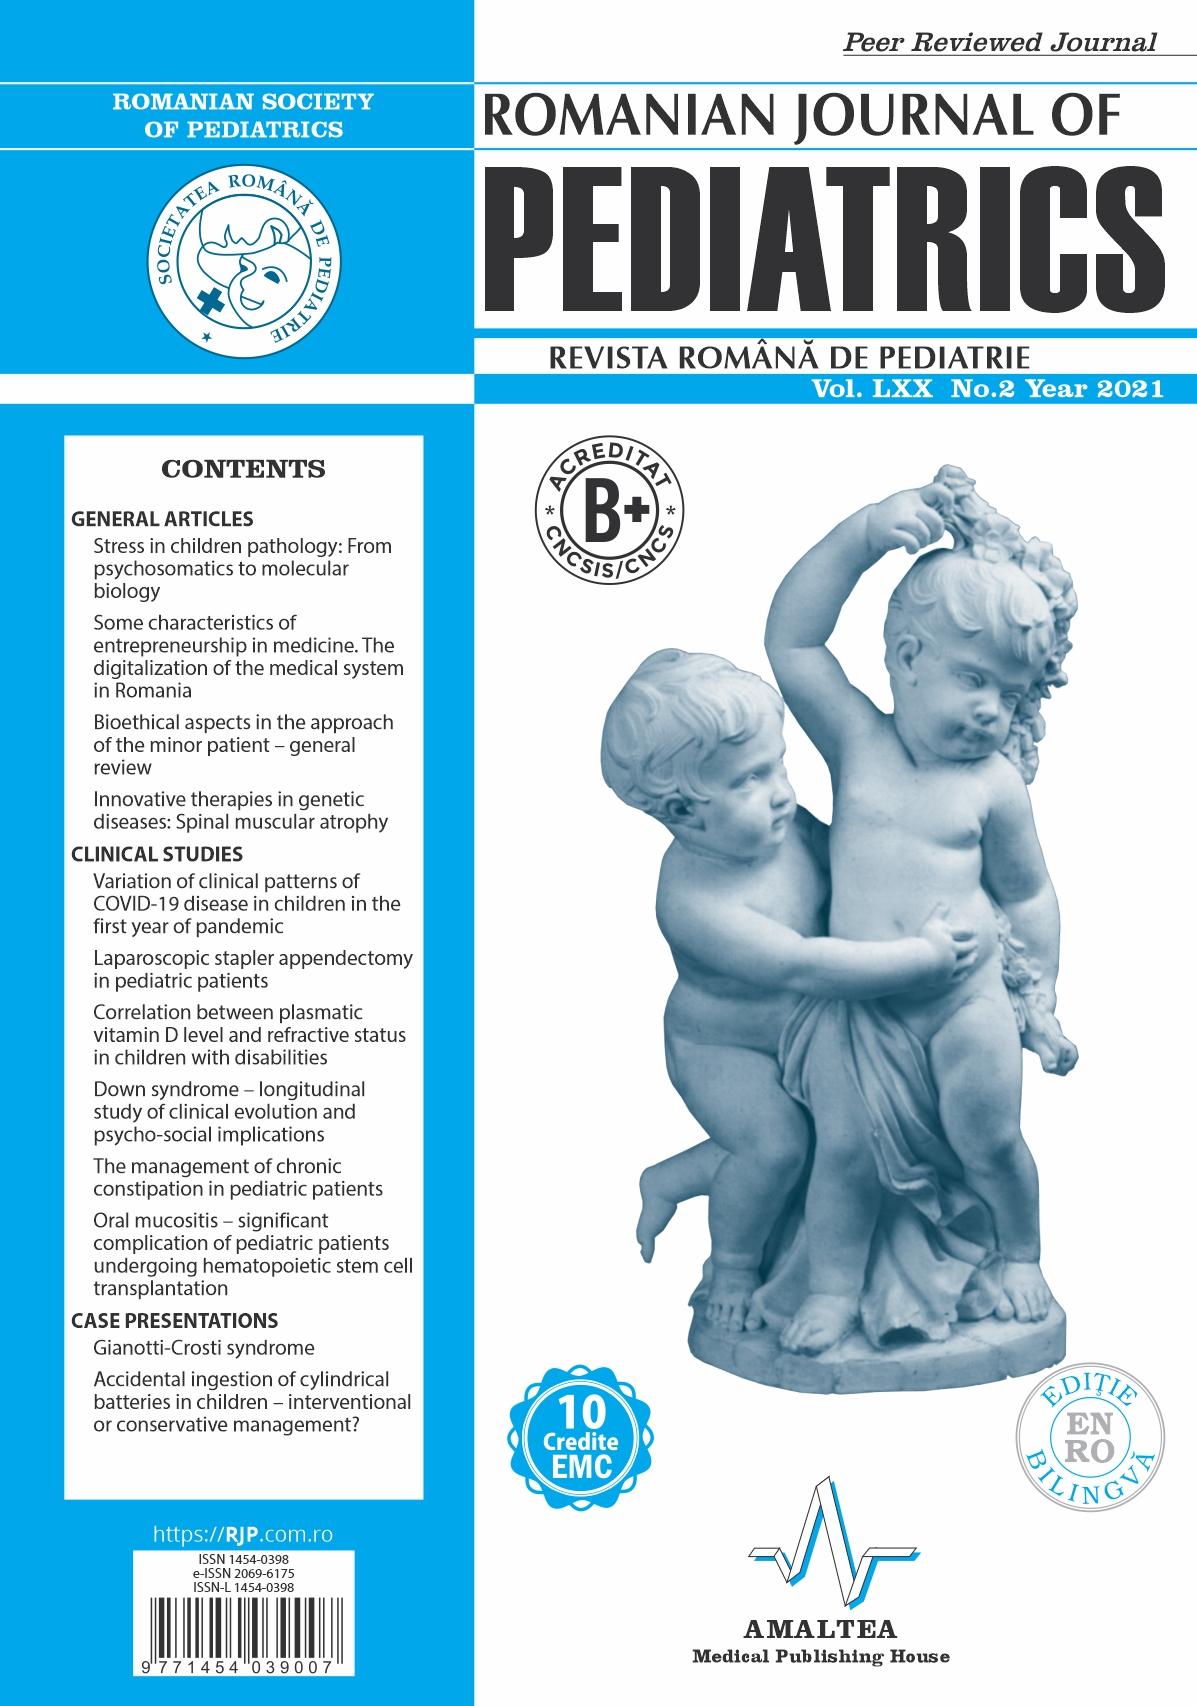 Romanian Journal of Pediatrics   Volume LXX, No. 2, Year 2021